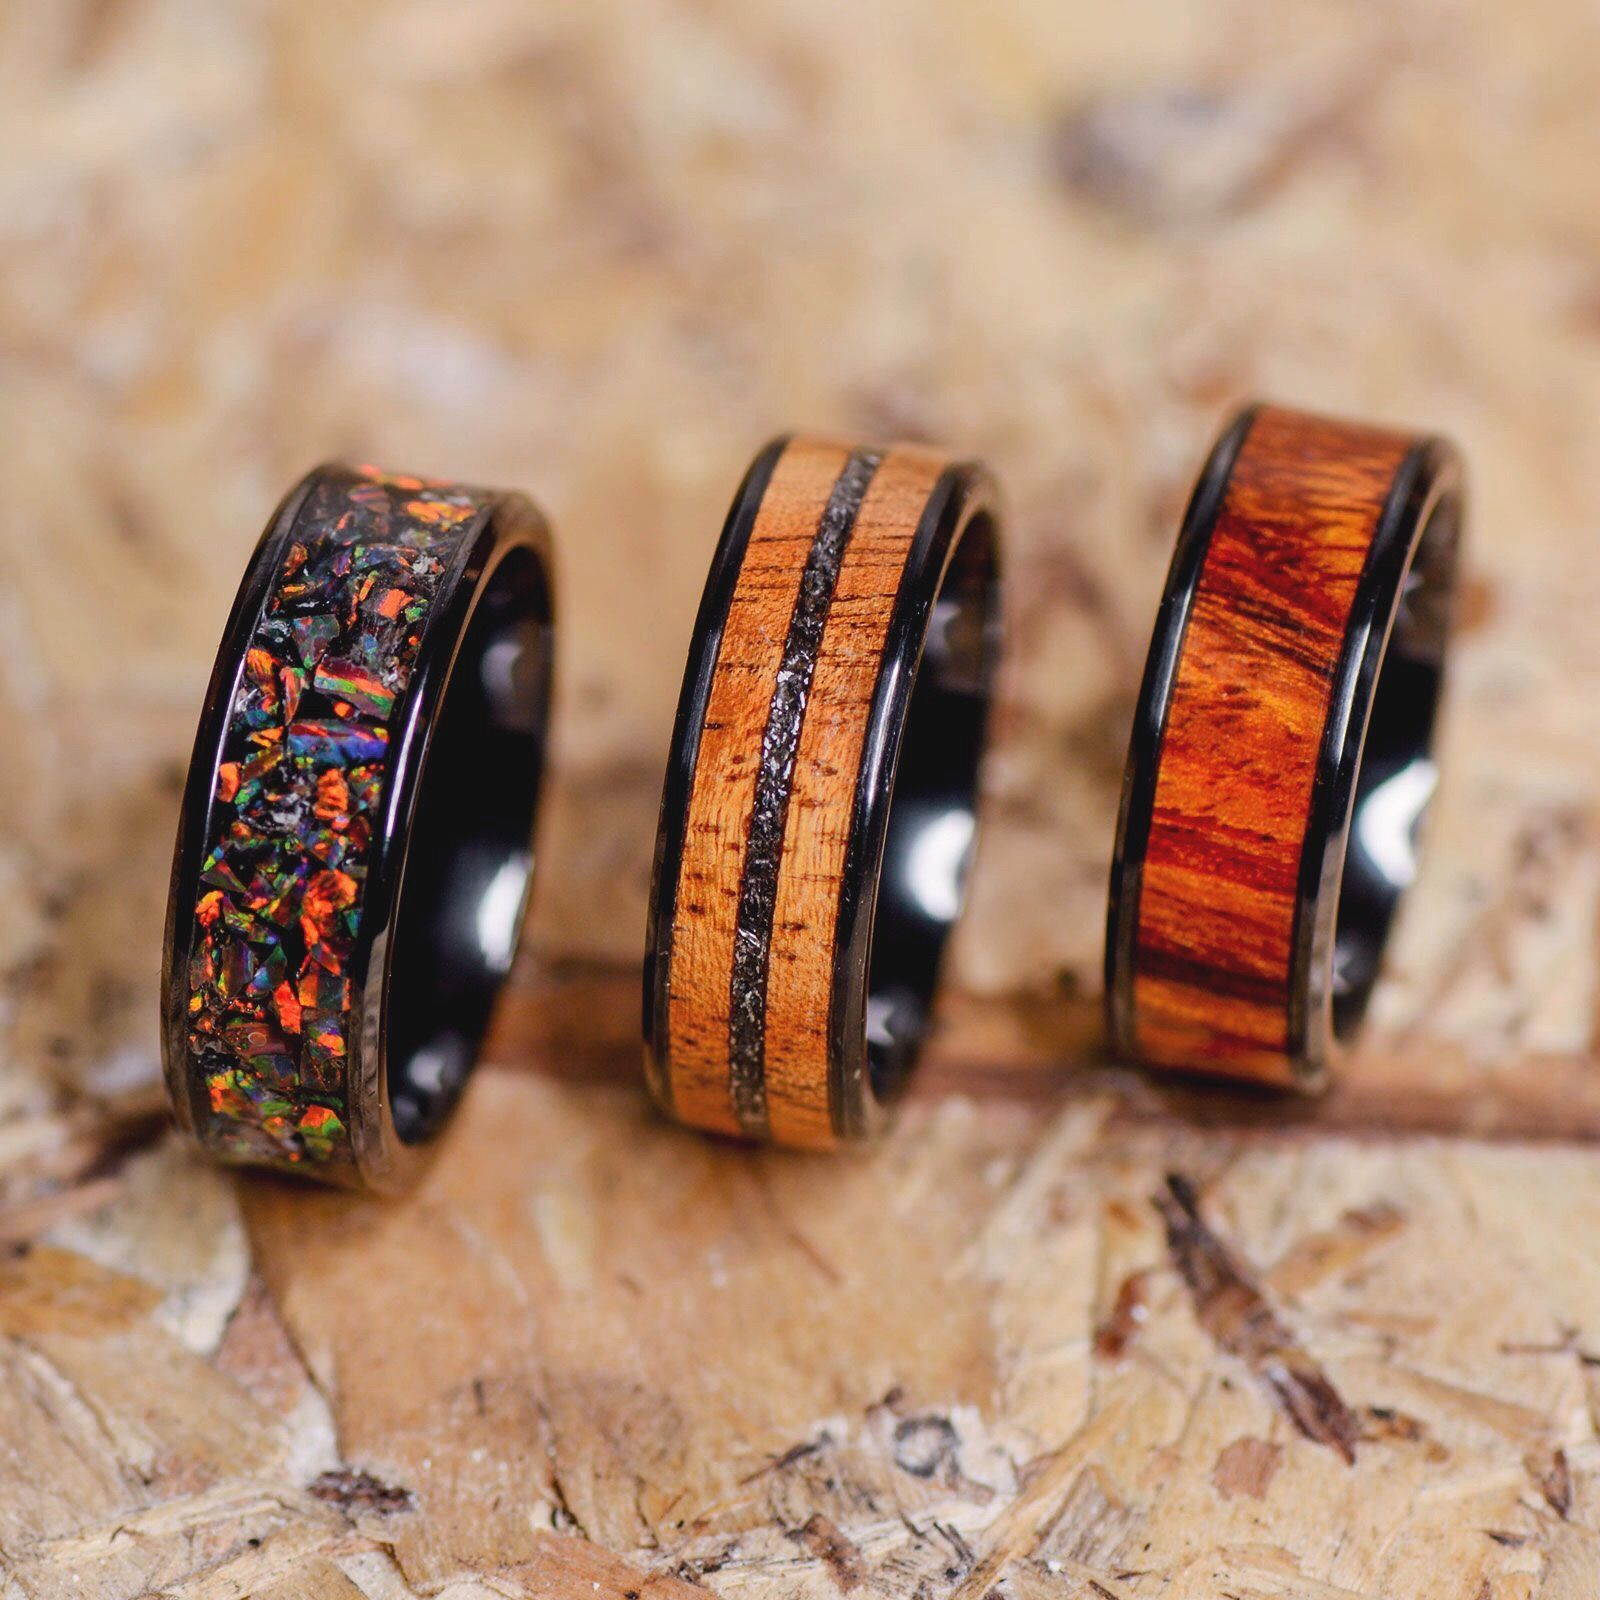 Jack Daniels Barrel Wood, Meteorite, & Guitar Strings